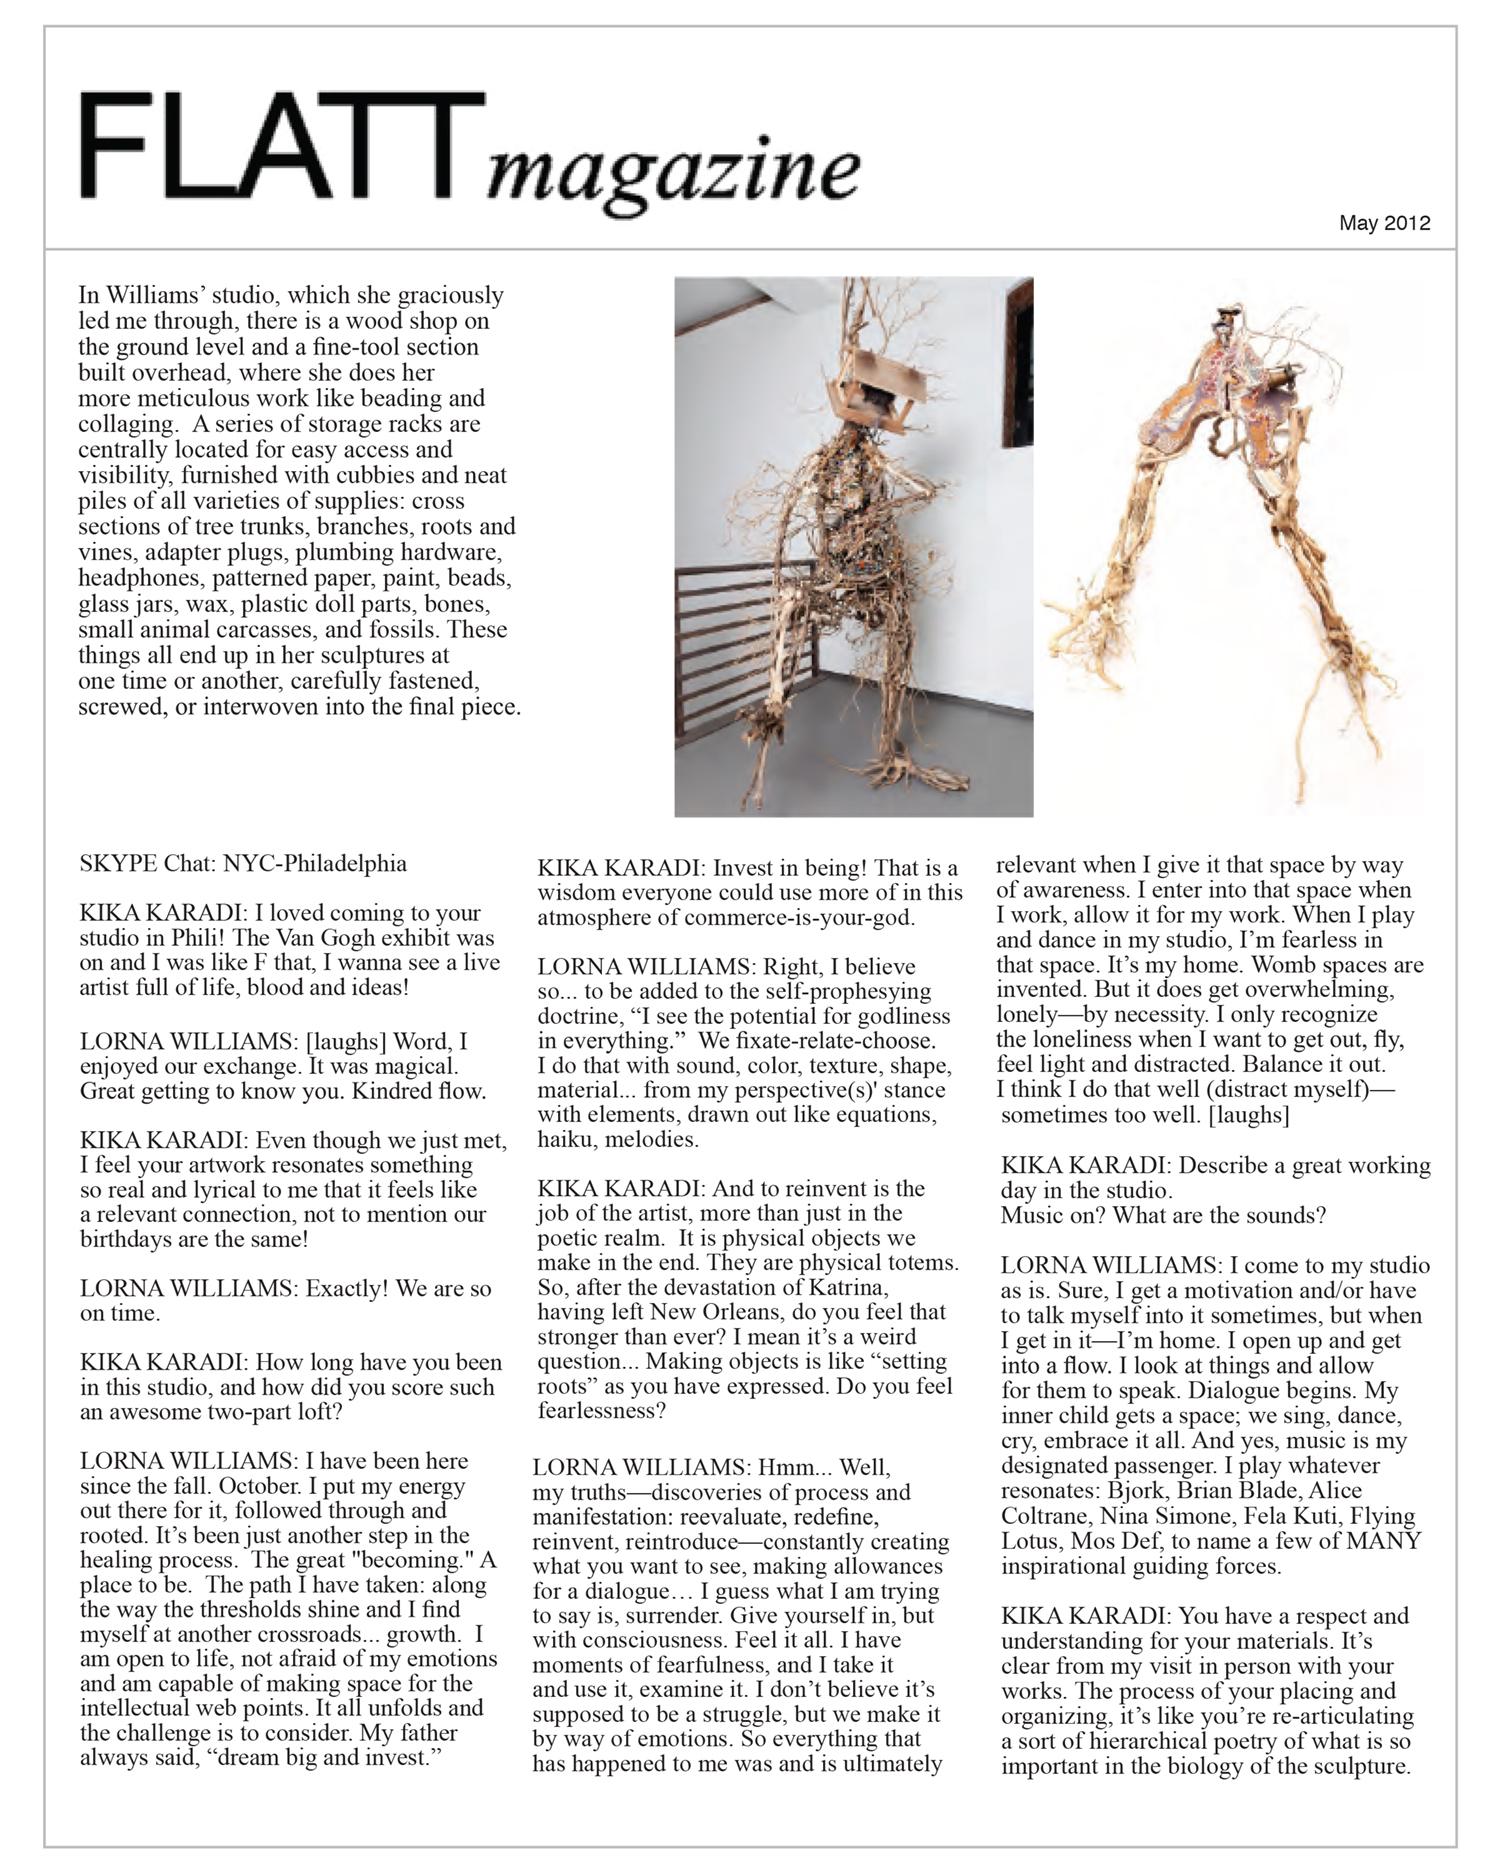 FlattMagazine_2_May 2012.jpg